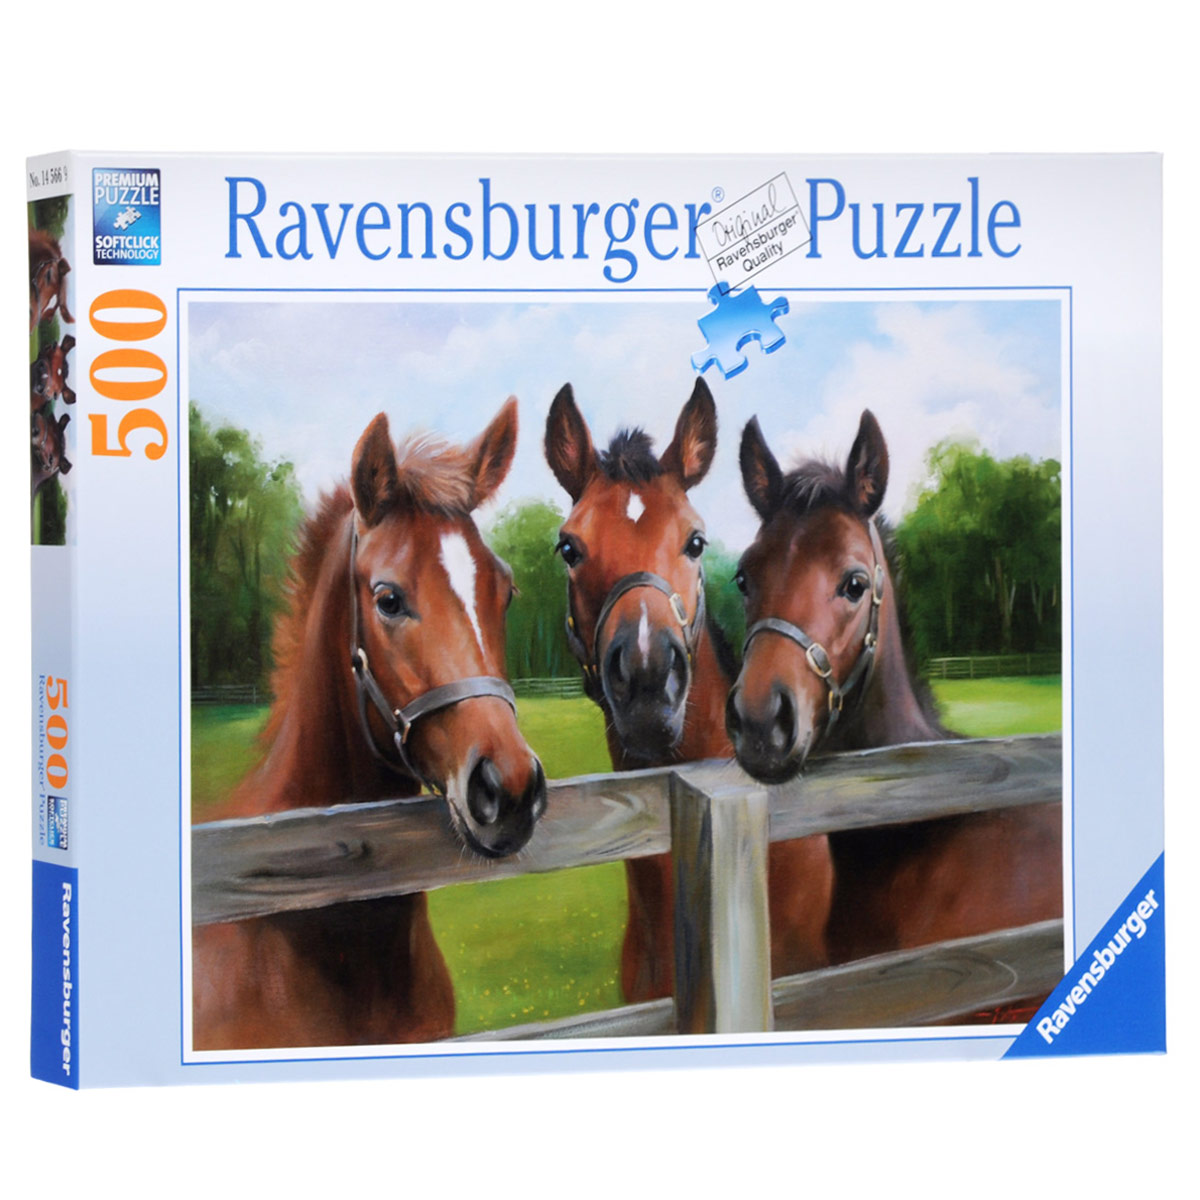 Ravensburger Три лошади. Пазл, 500 элементов